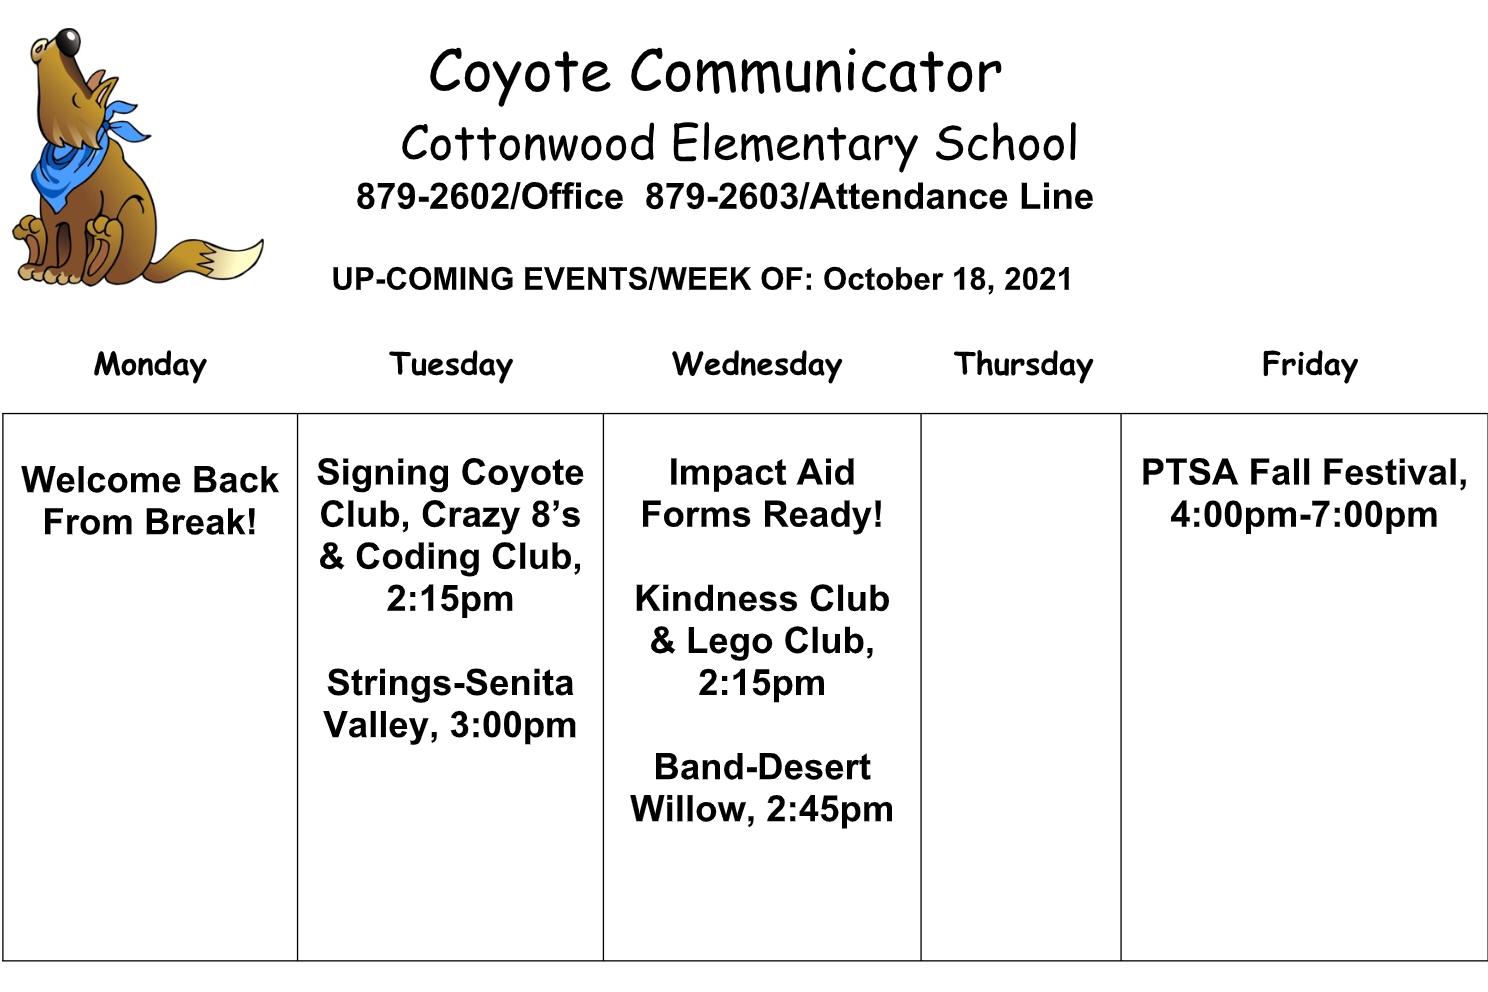 Coyote Communicator